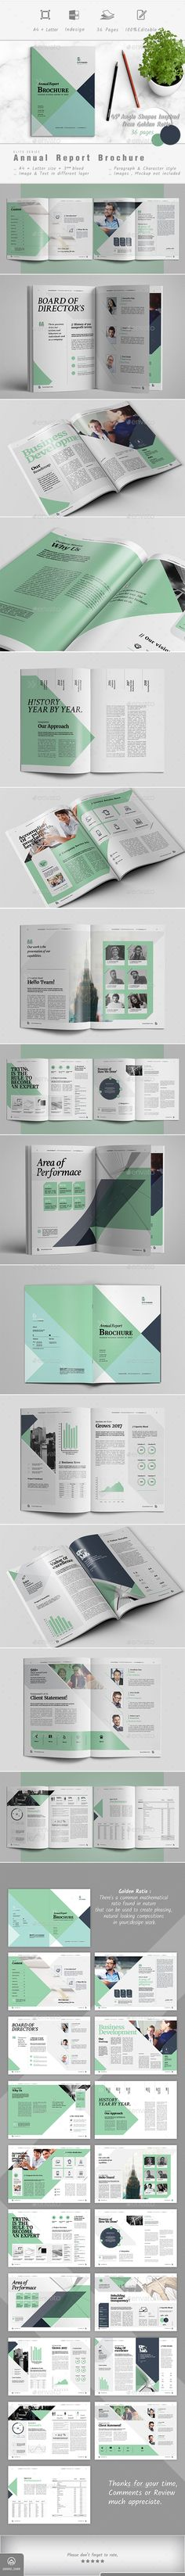 Annual Report Travel Brochure Template, Brochure Layout, Corporate Brochure, Corporate Design, Brochure Design, Company Brochure, Business Brochure, Page Layout Design, Book Design